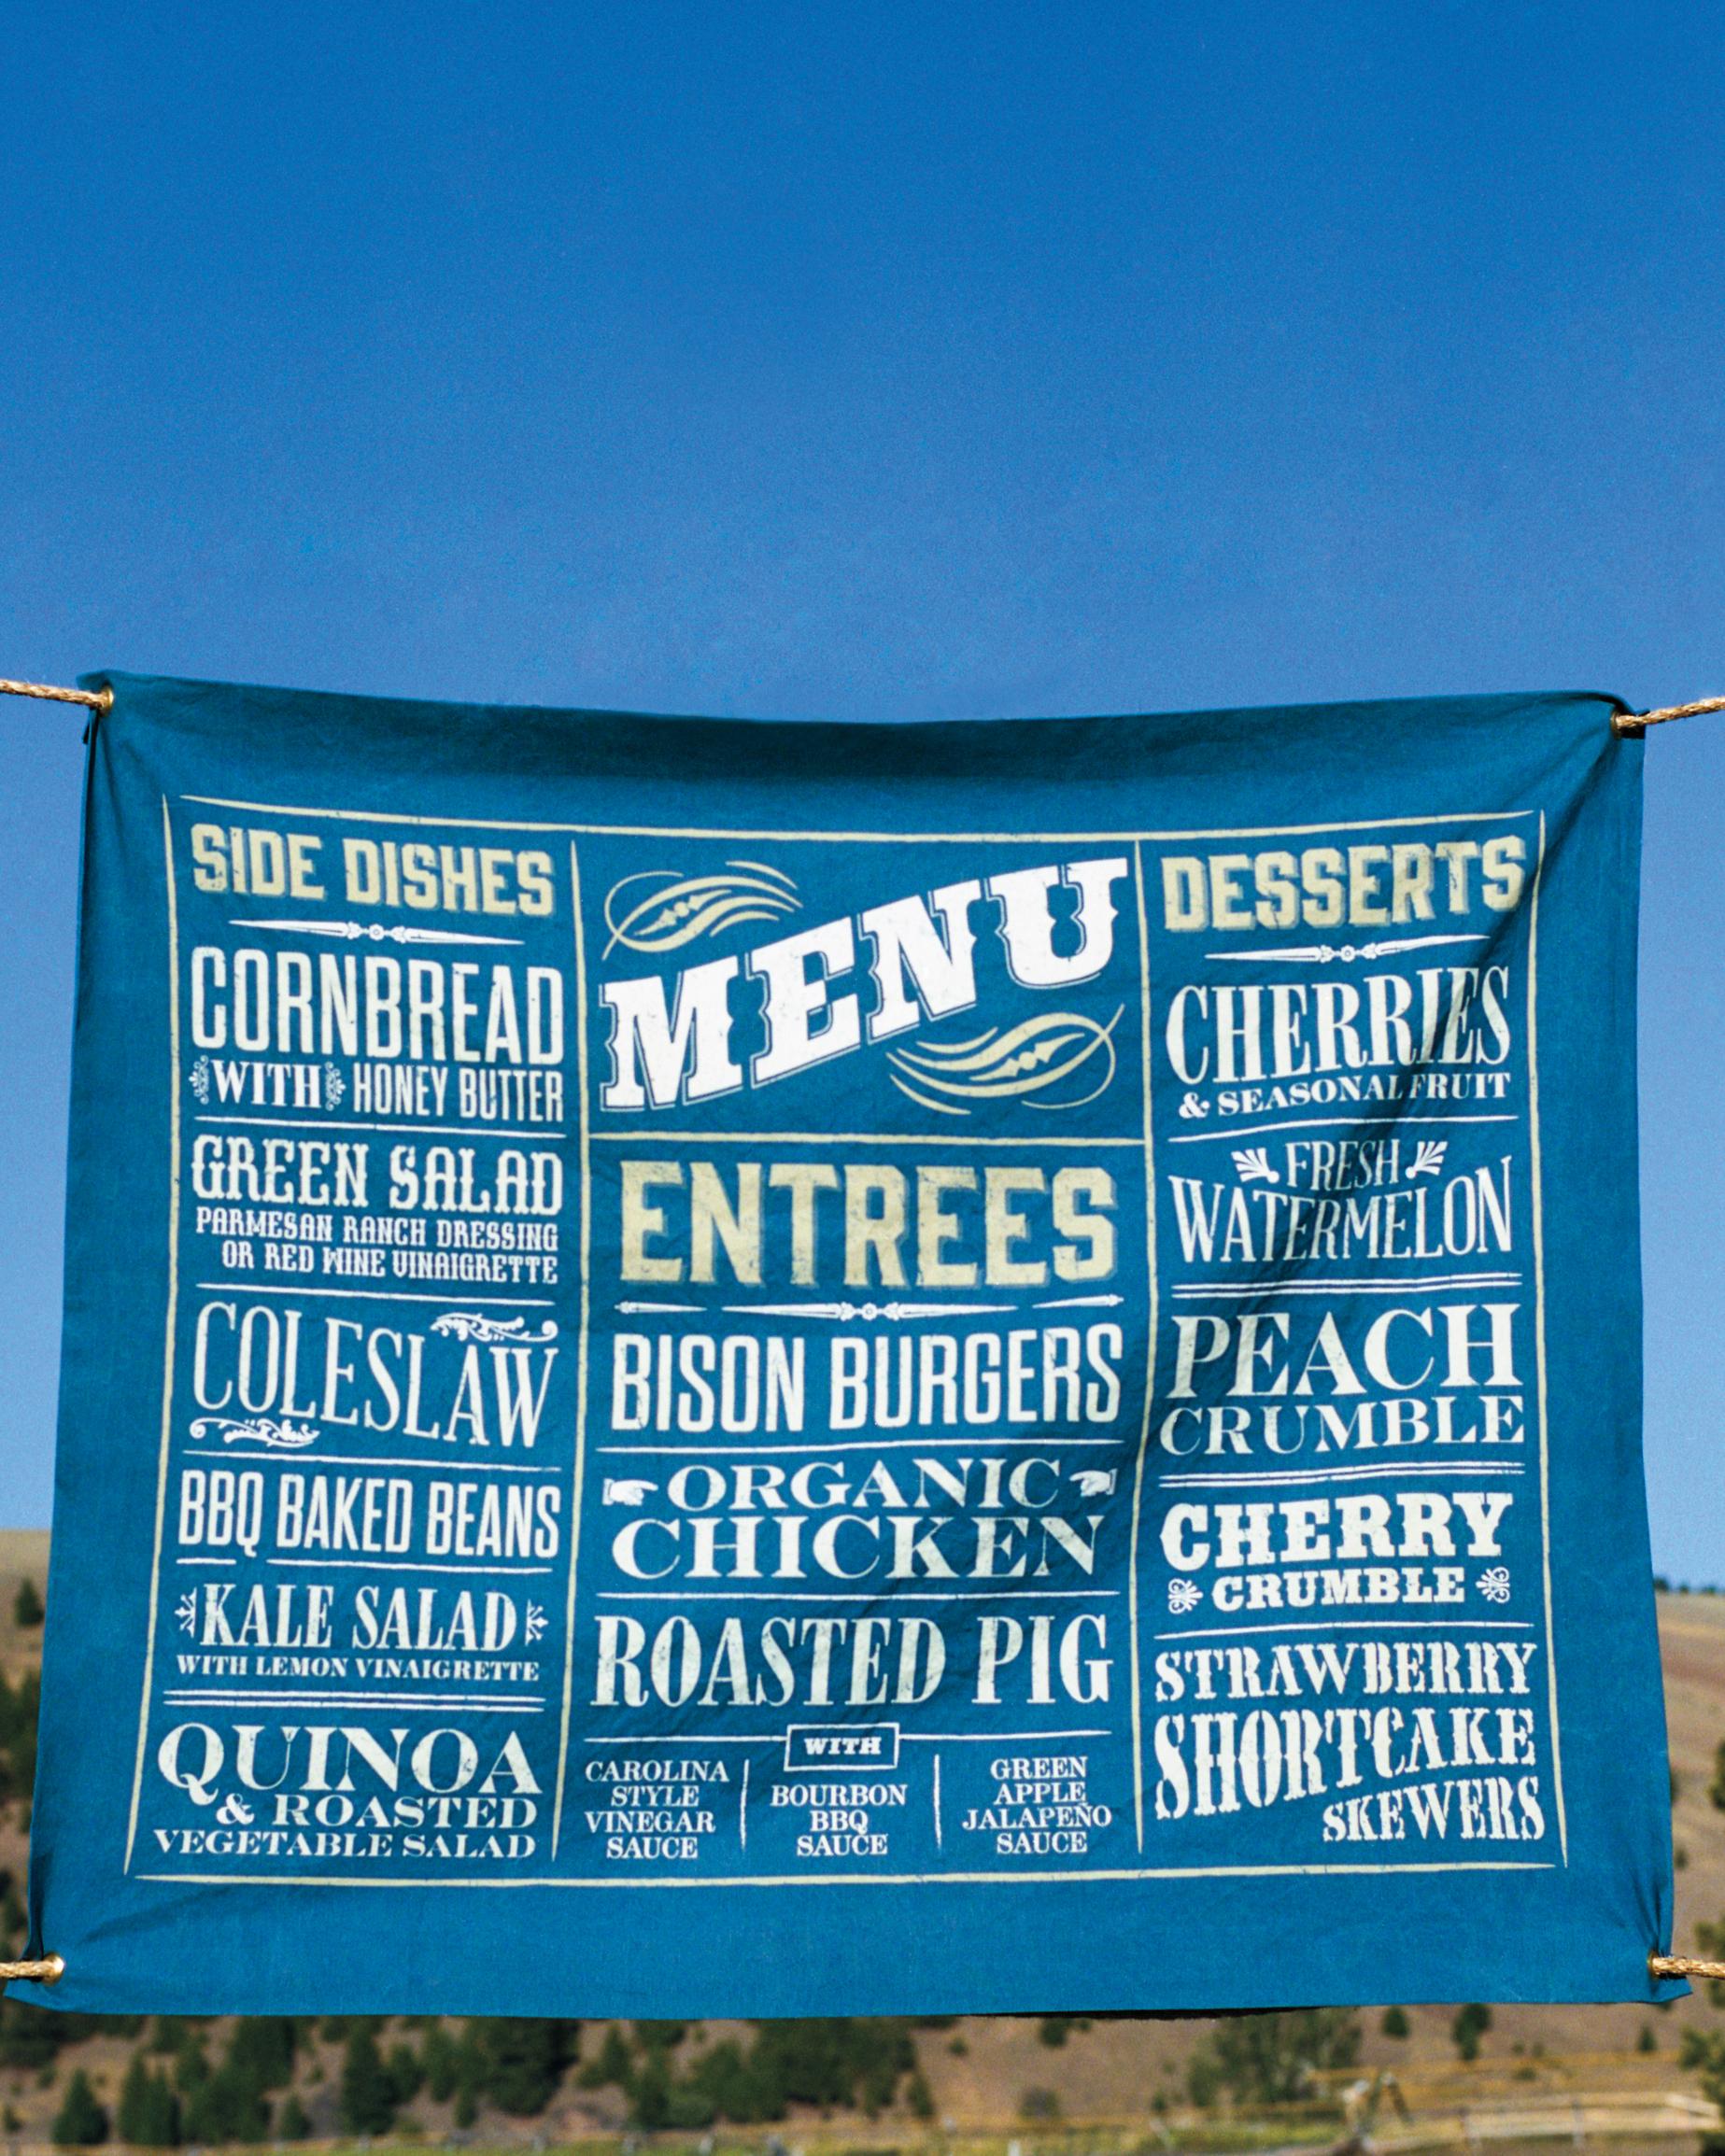 kate-michael-menu-banner-13-13n-mwd110537.jpg